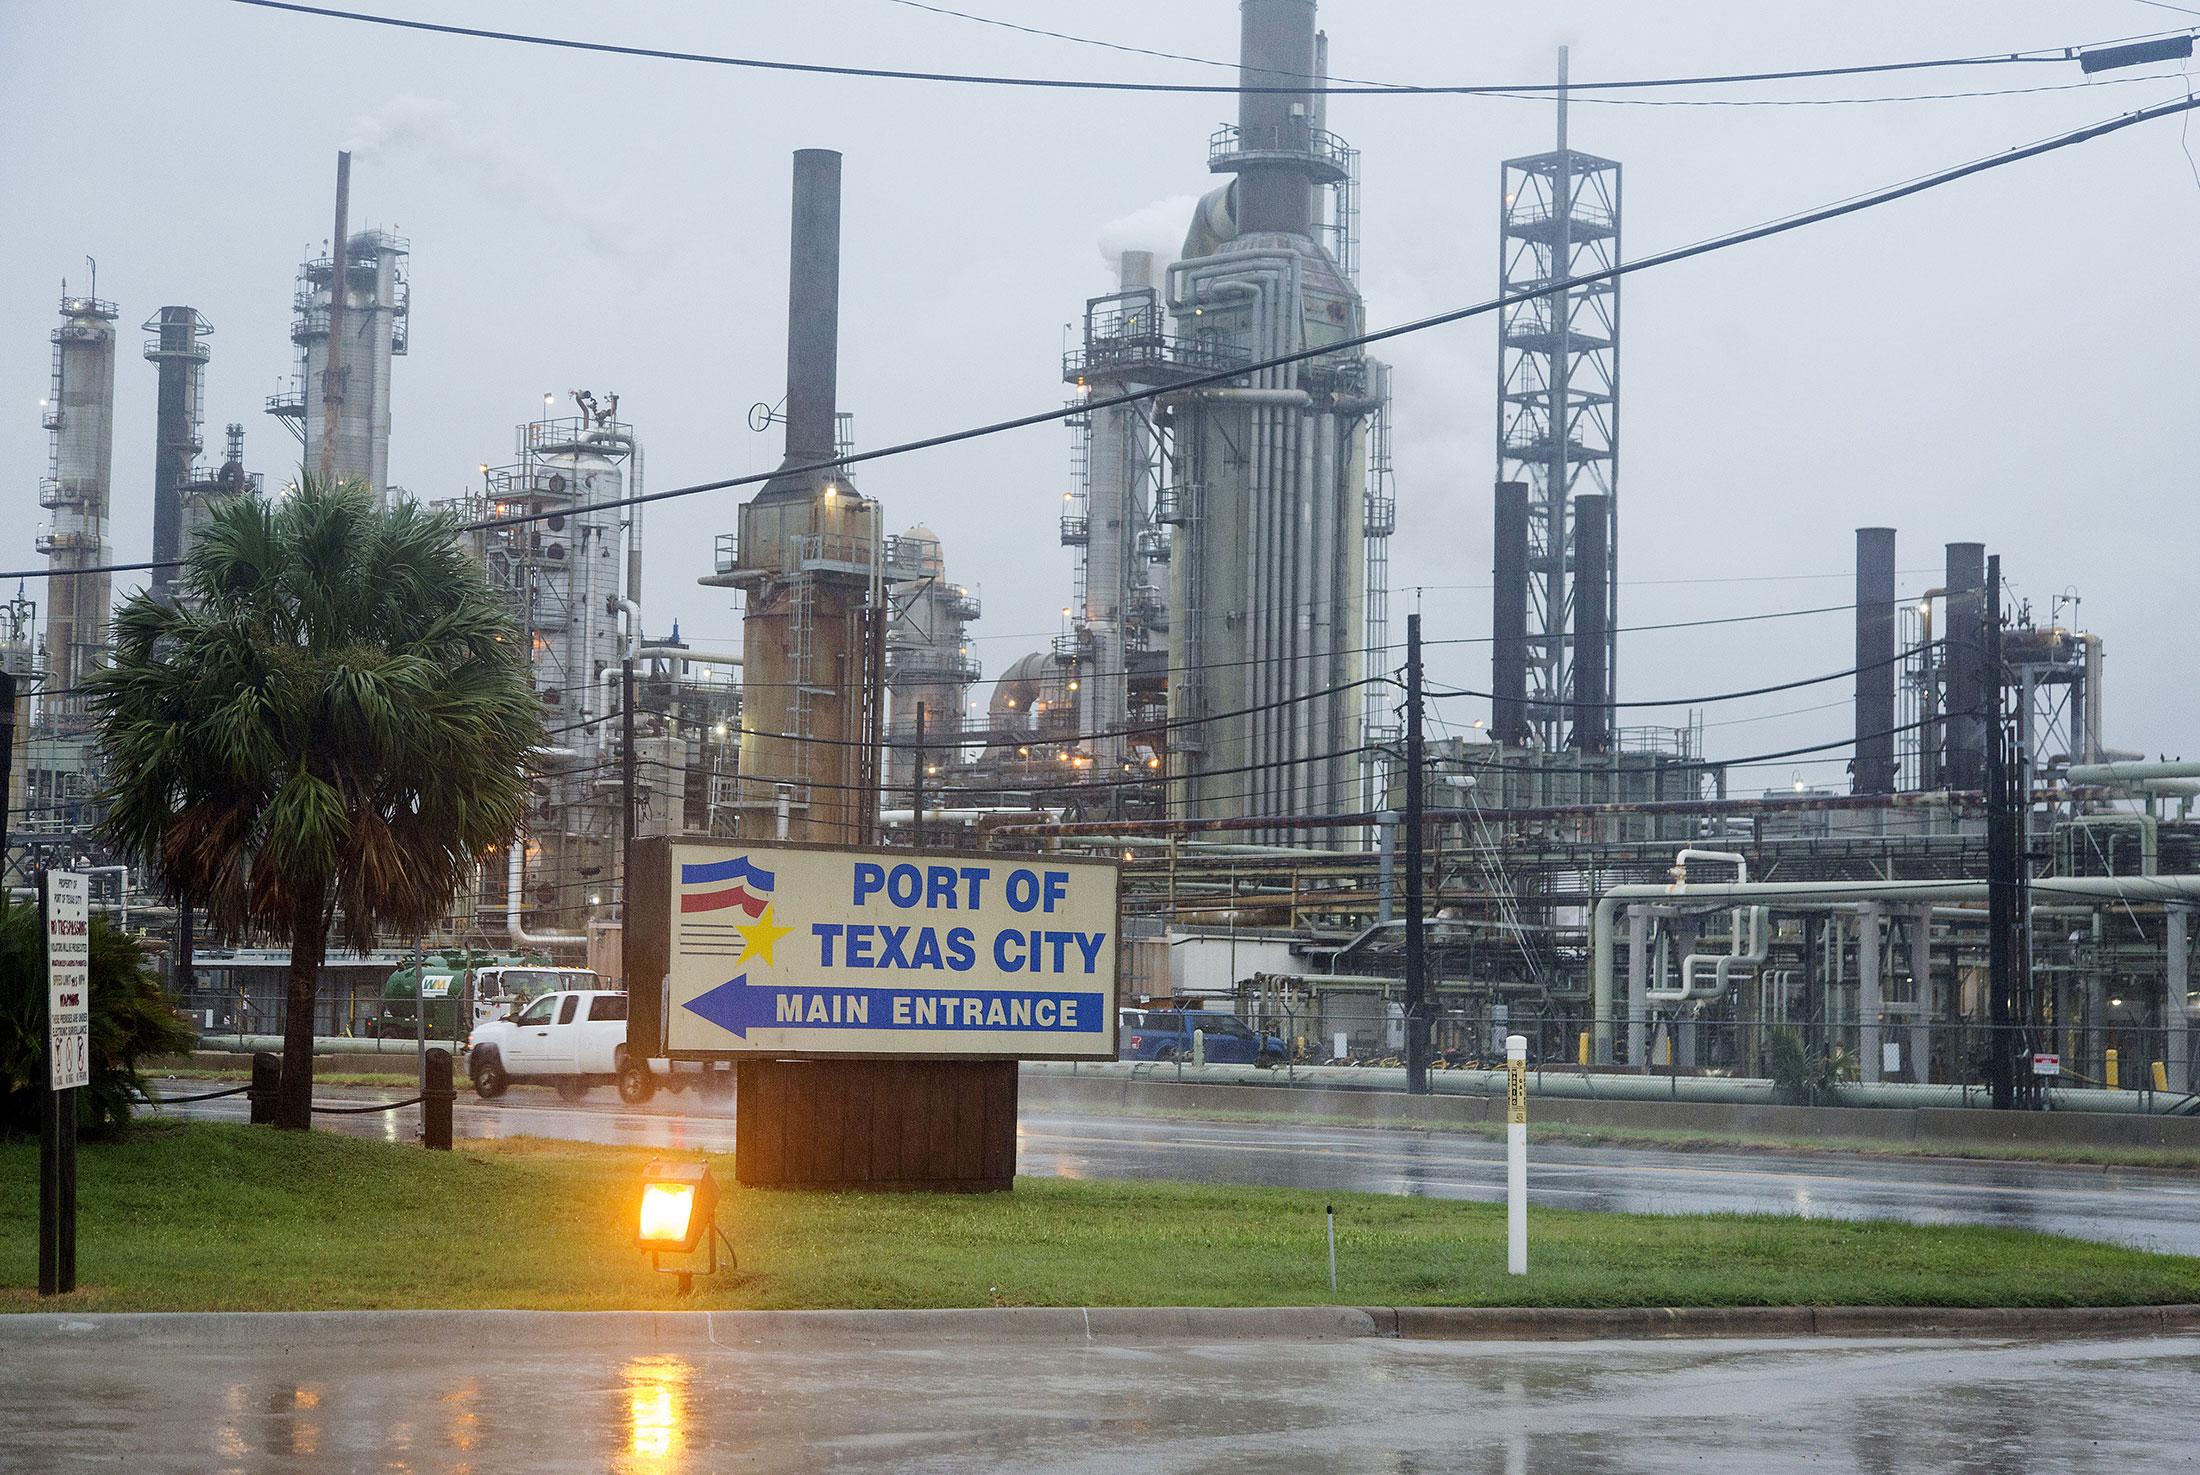 Marathon Oil Stock Quote Mpcnew York Stock Quote  Marathon Petroleum Corp  Bloomberg Markets